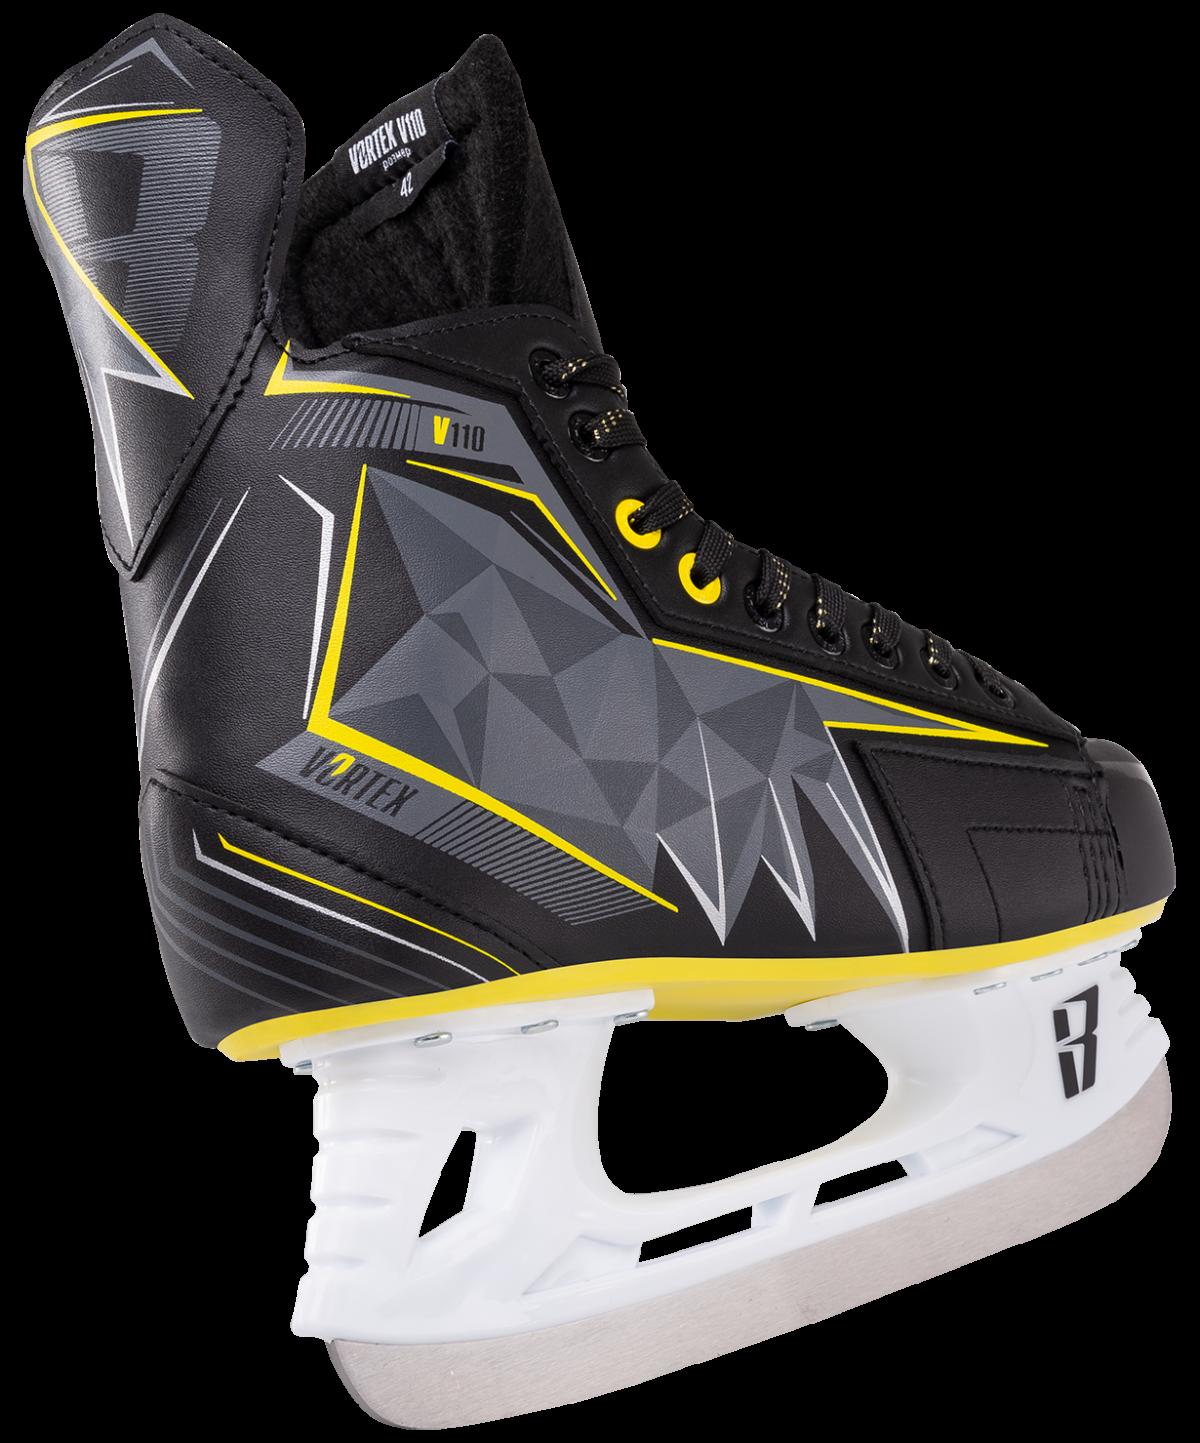 ICE BLADE Коньки хоккейные Vortex V110 - 4